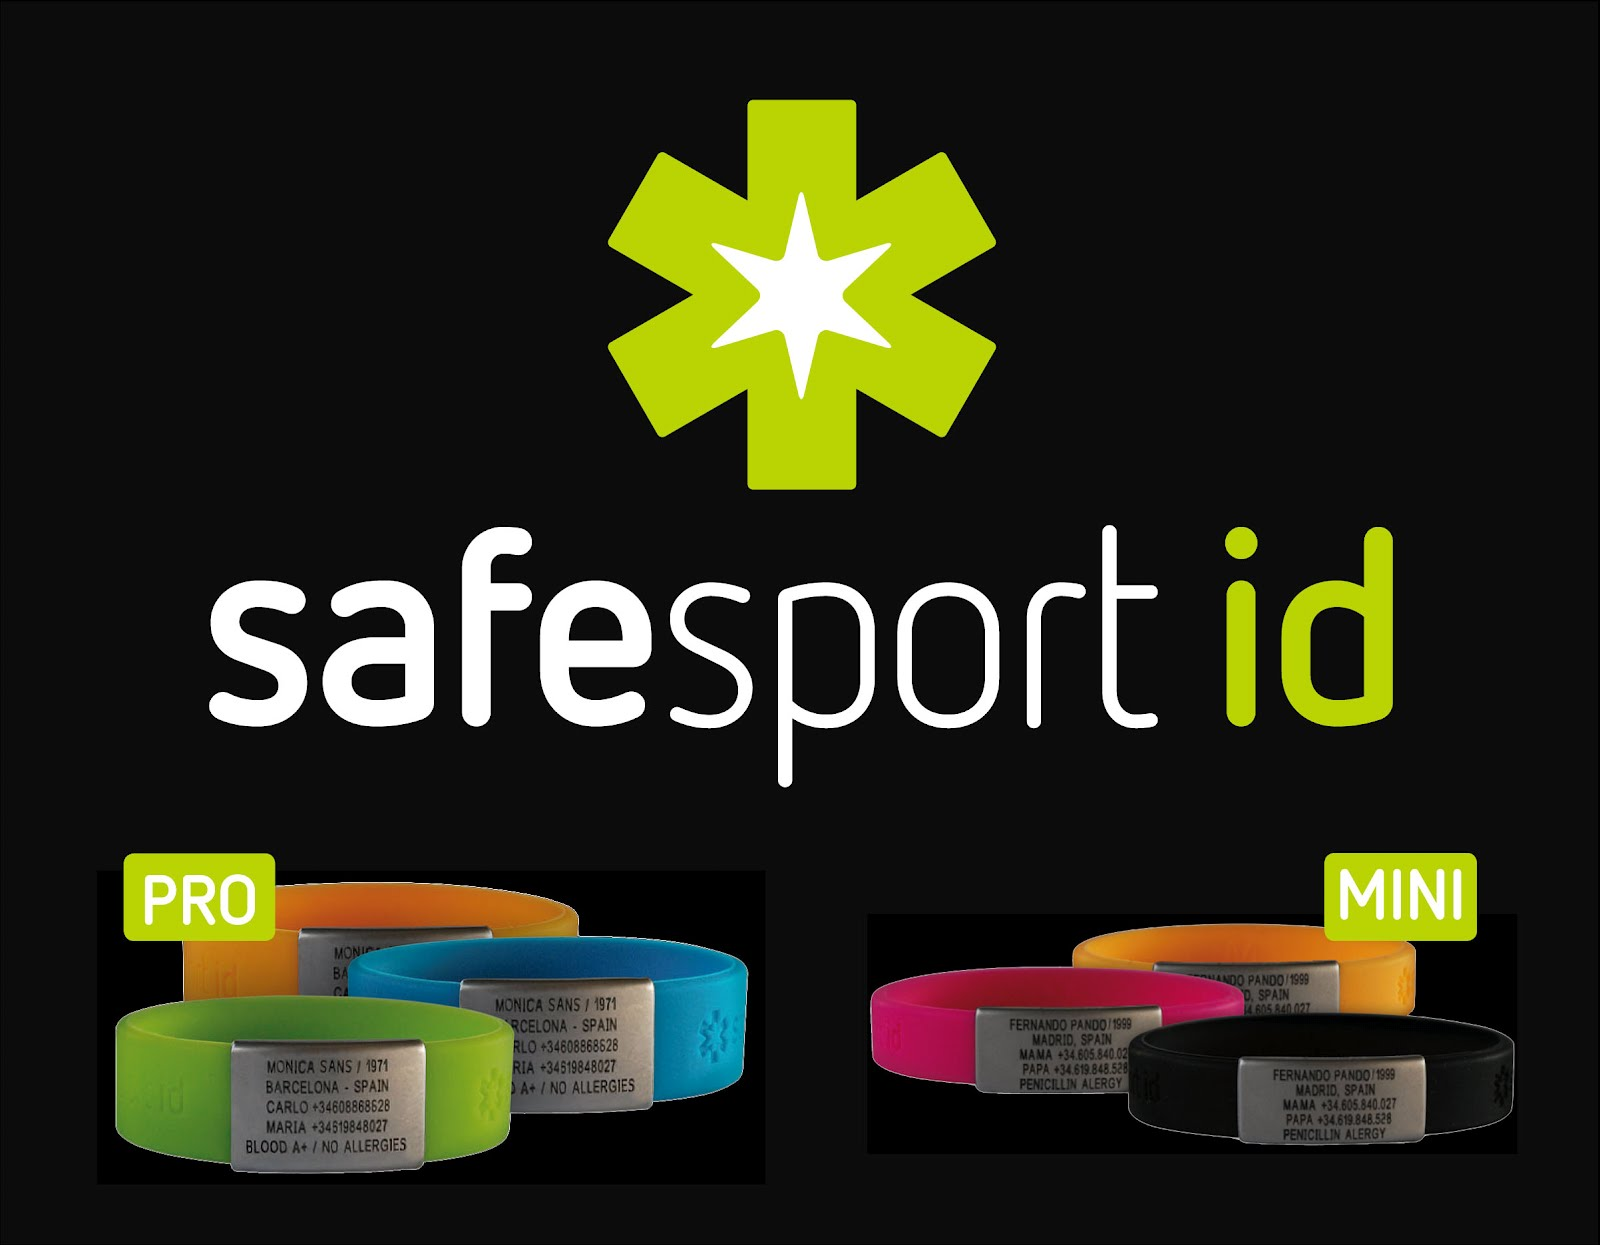 SAFESPORT.ID